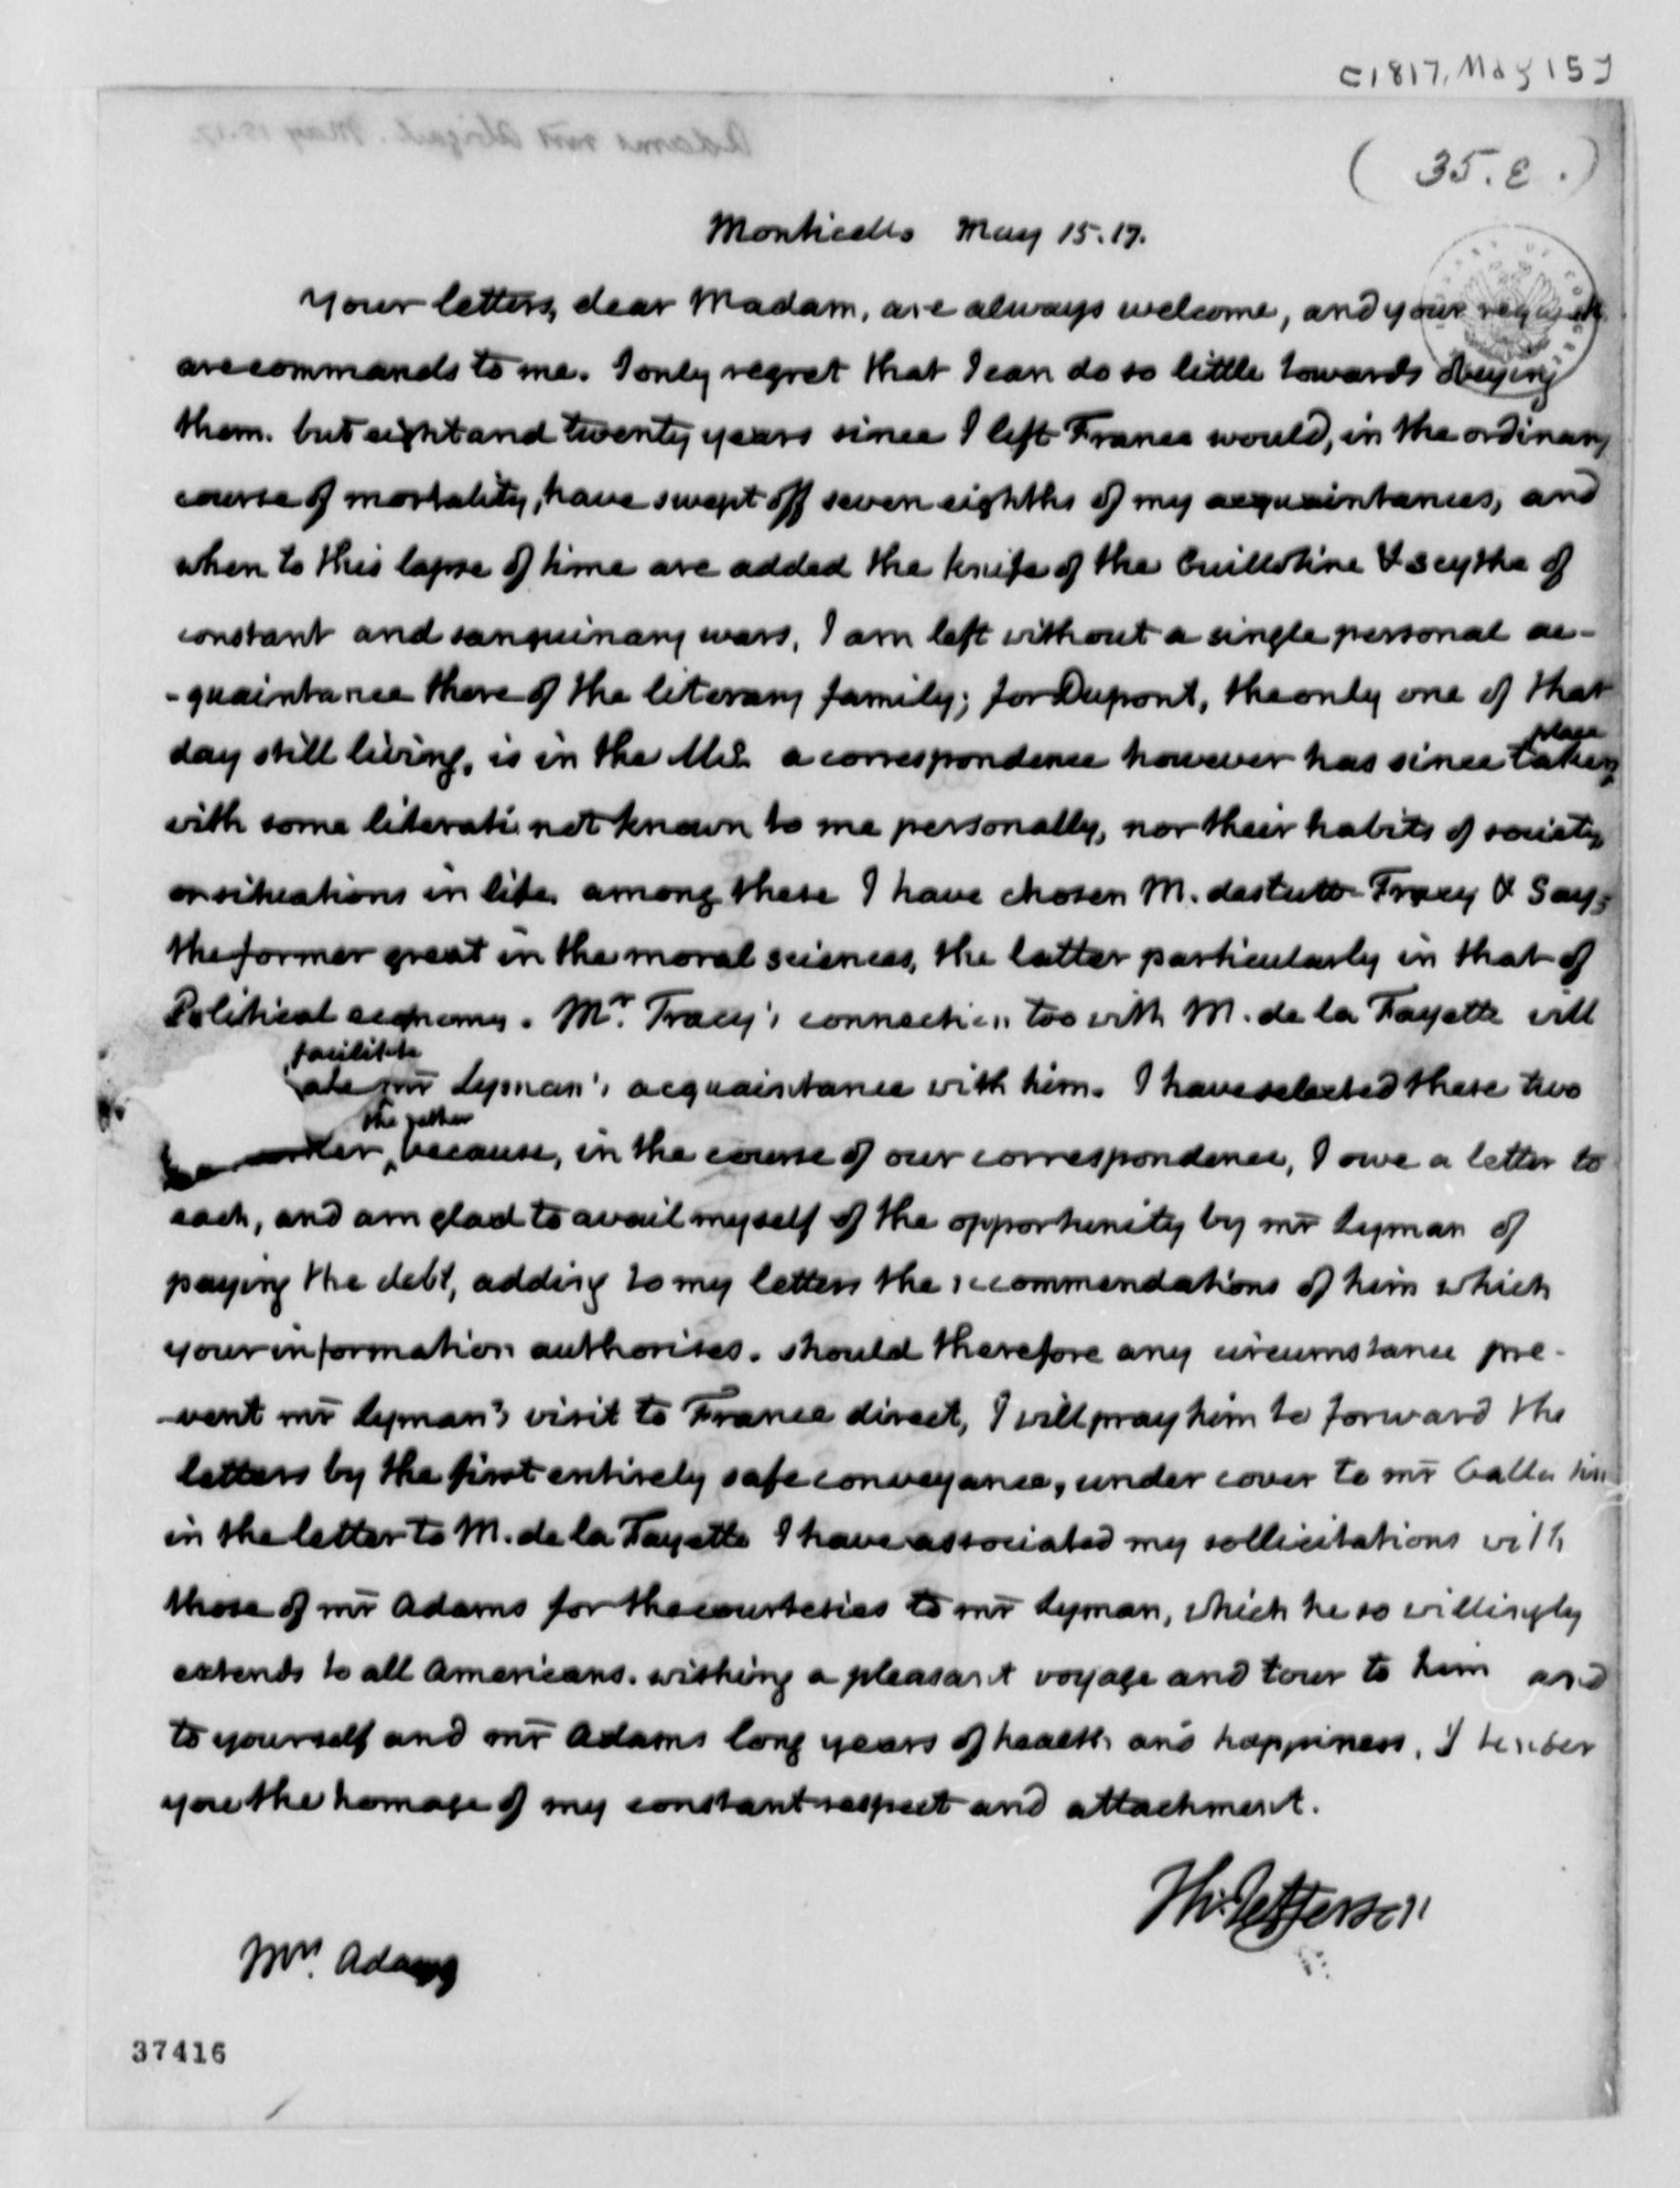 009 Thomas Jefferson Essay Magnificent On Education Questions Outline 1920